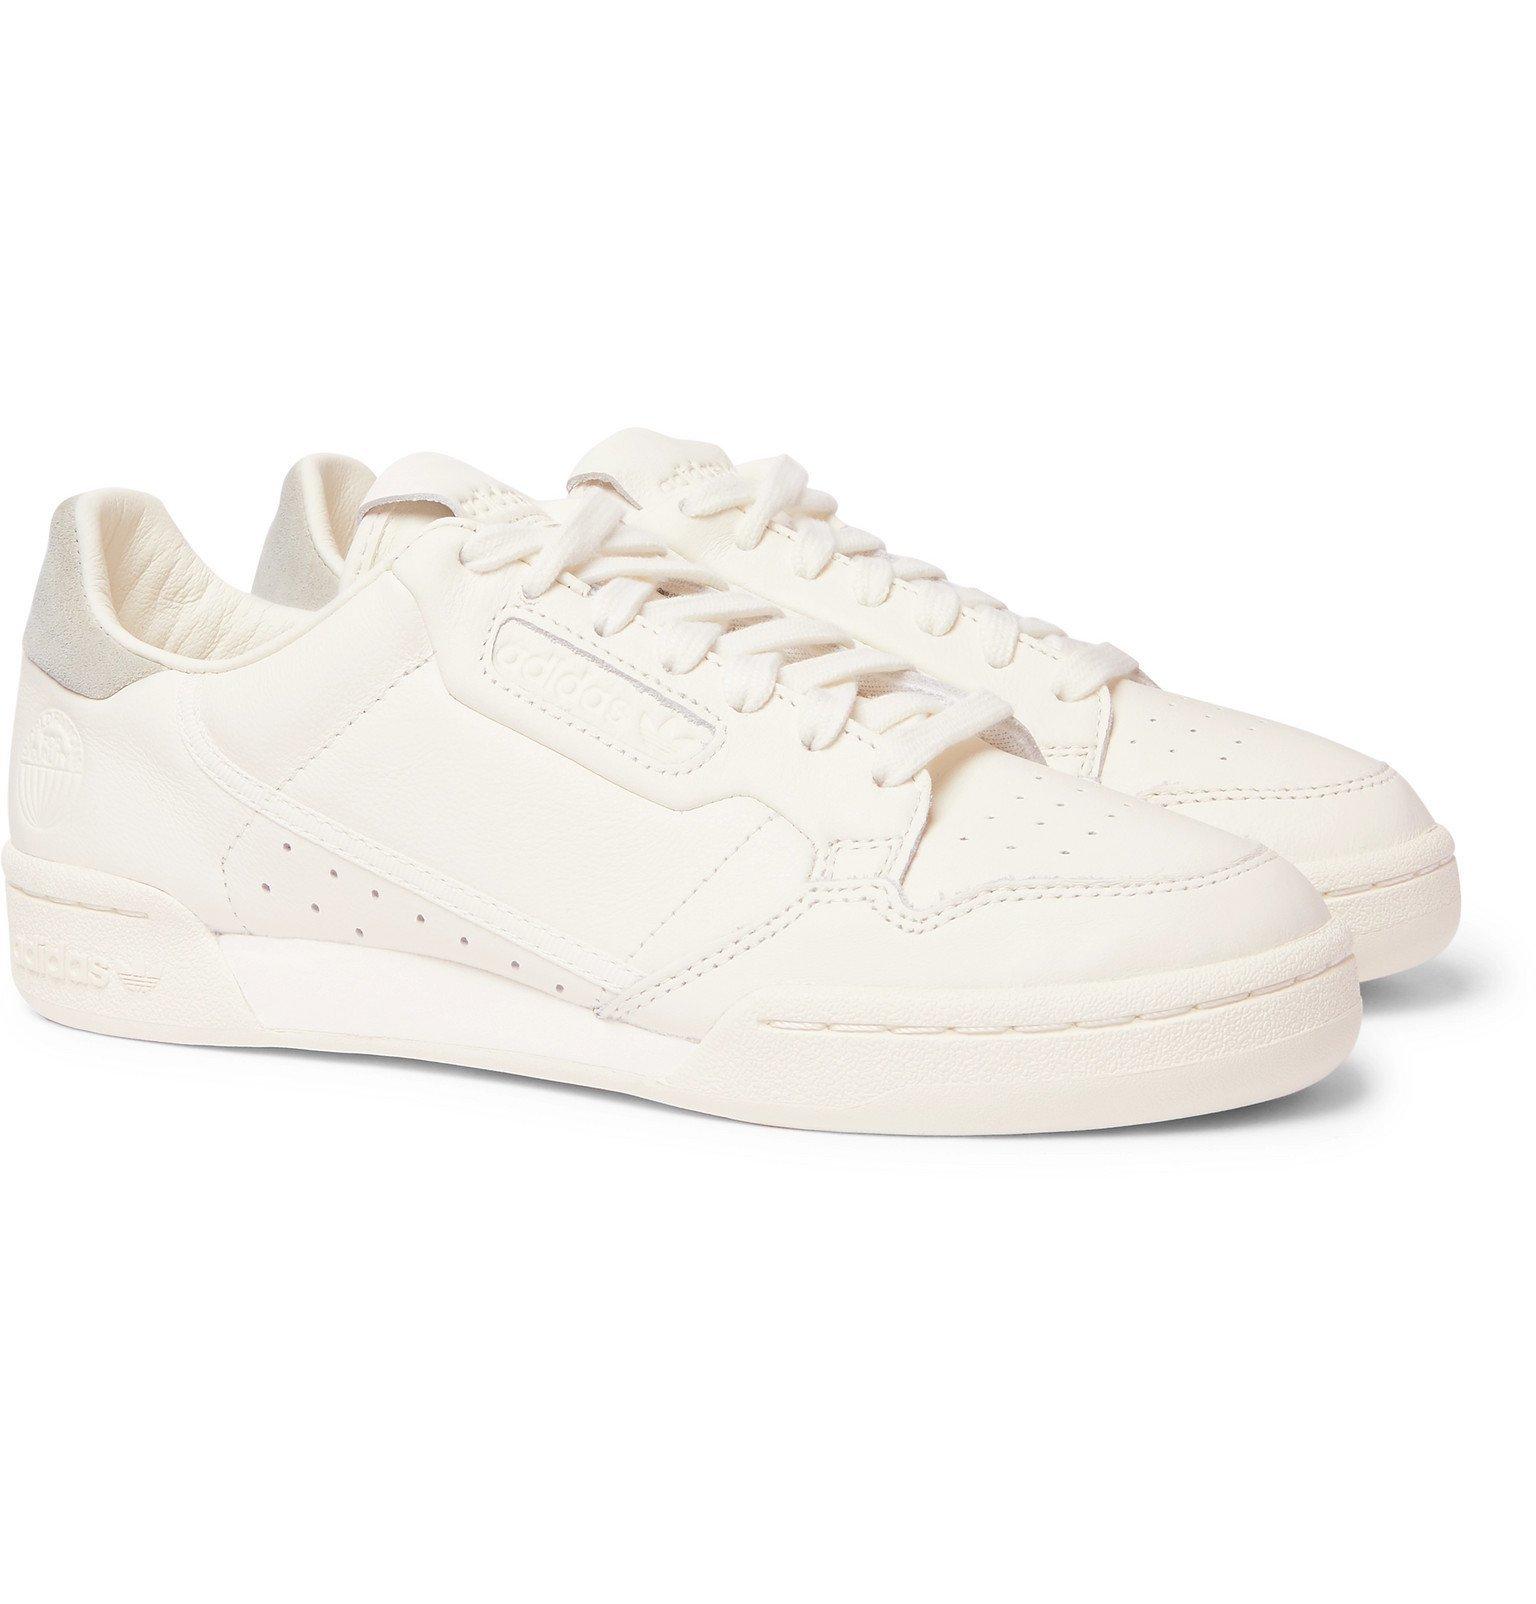 adidas Originals - Continental 80 Leather Sneakers - Neutrals